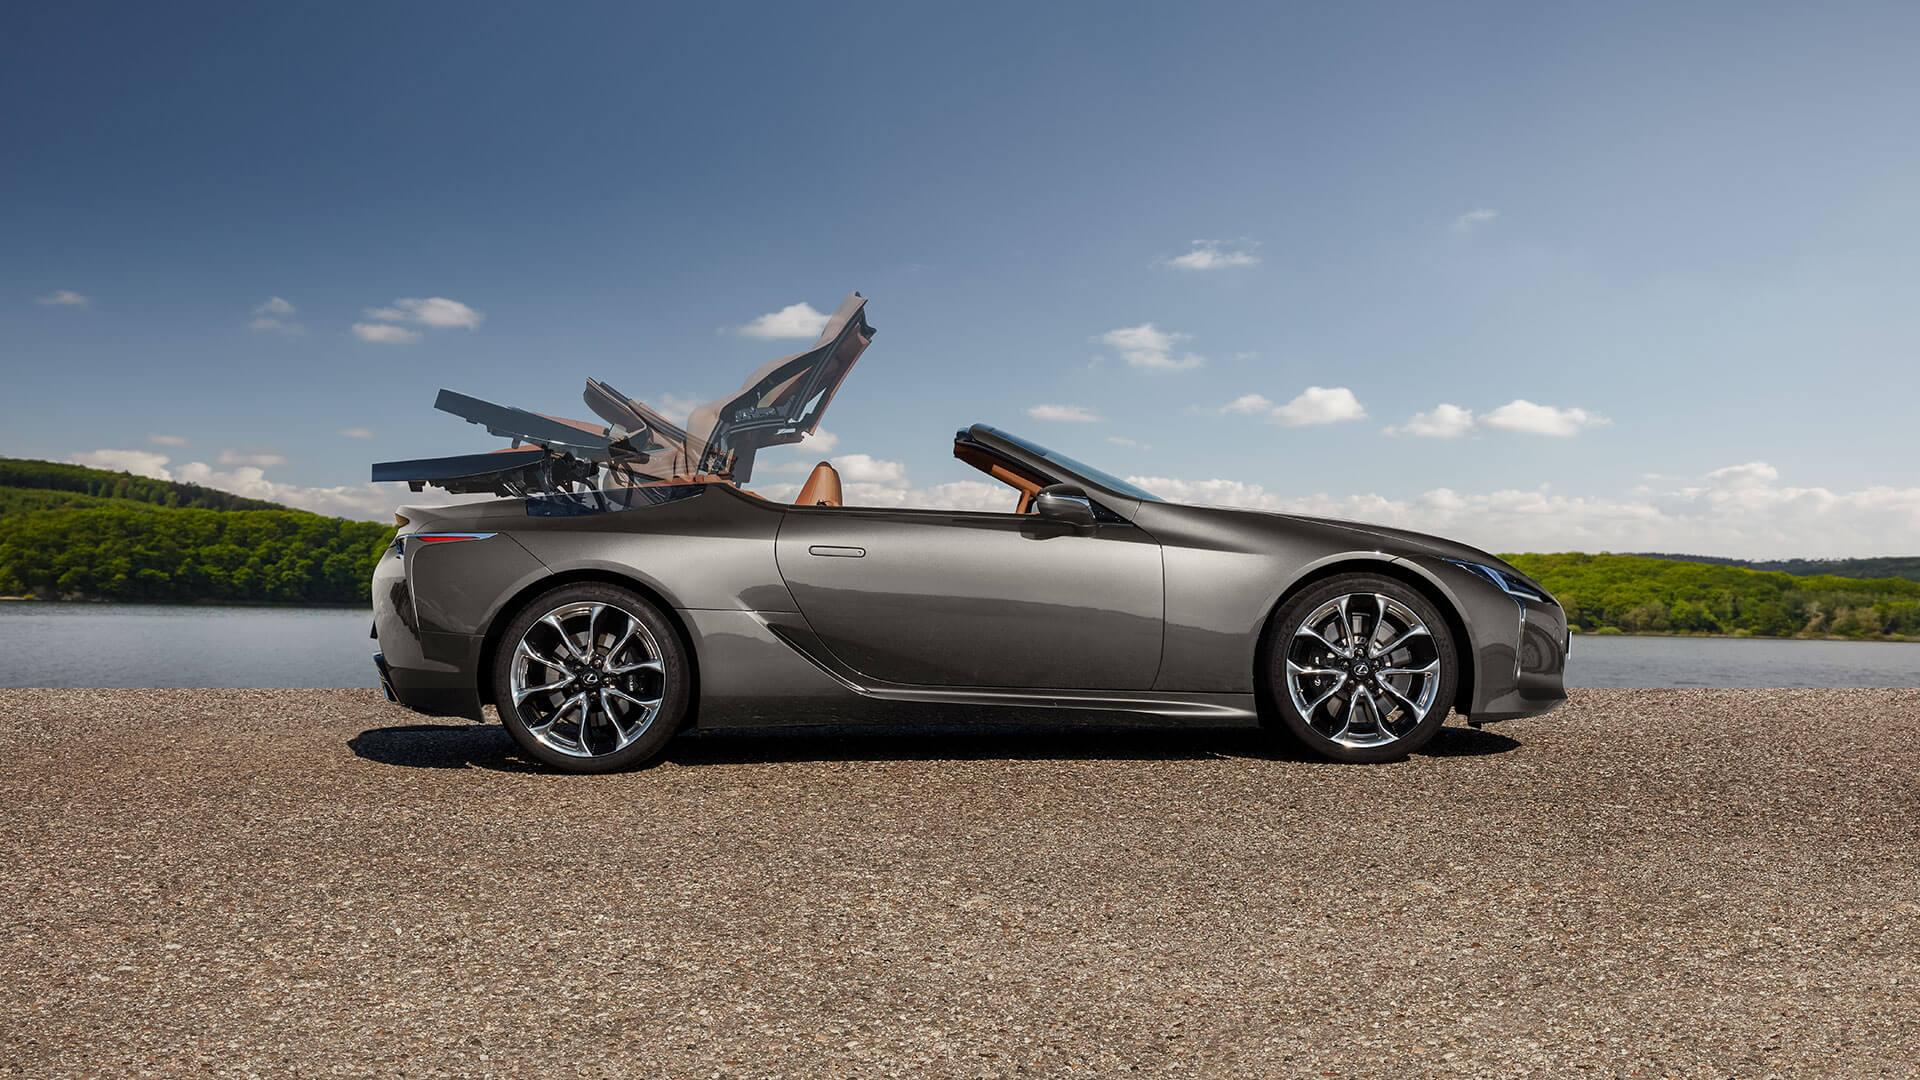 LC Convertible Best Luxury Car Award 02